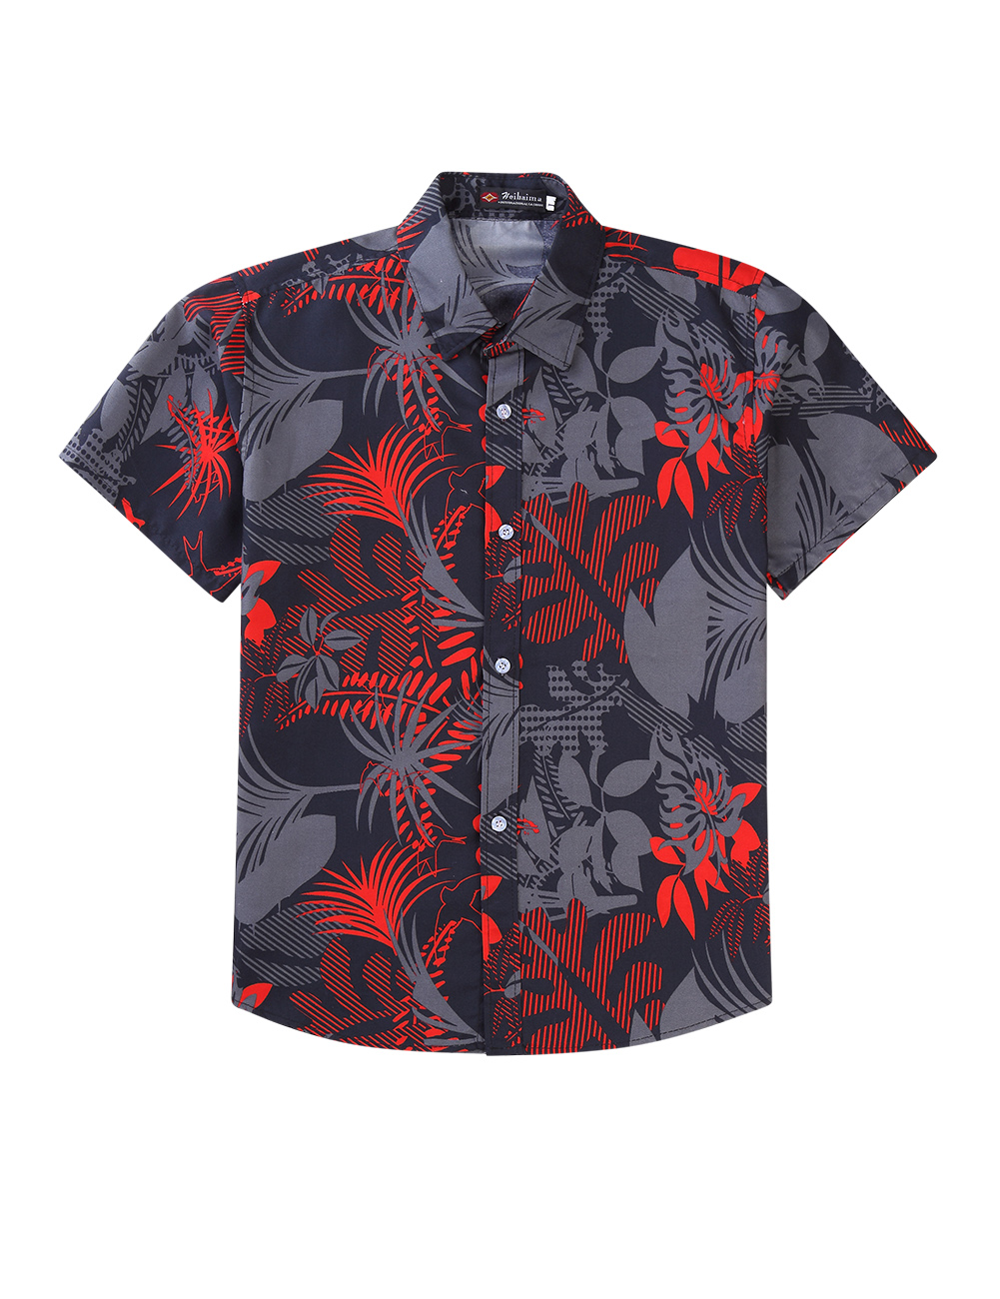 Men Women Hawaiian Summer Casual Printing Couples Short Sleeve Shirt